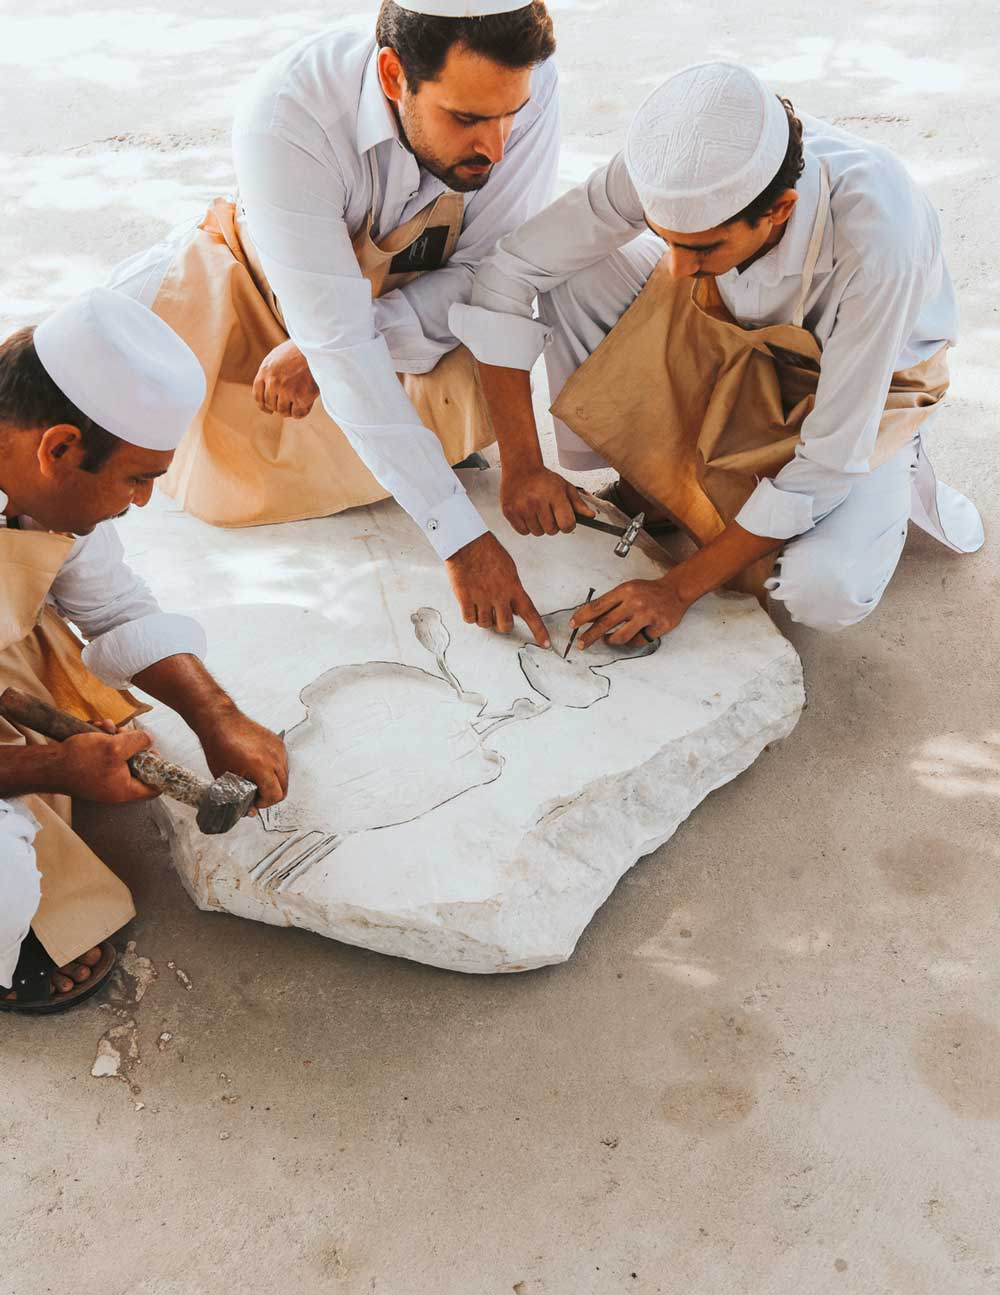 kunsthandwerk-steinintarsien-lel-handwerker-decohome.de_